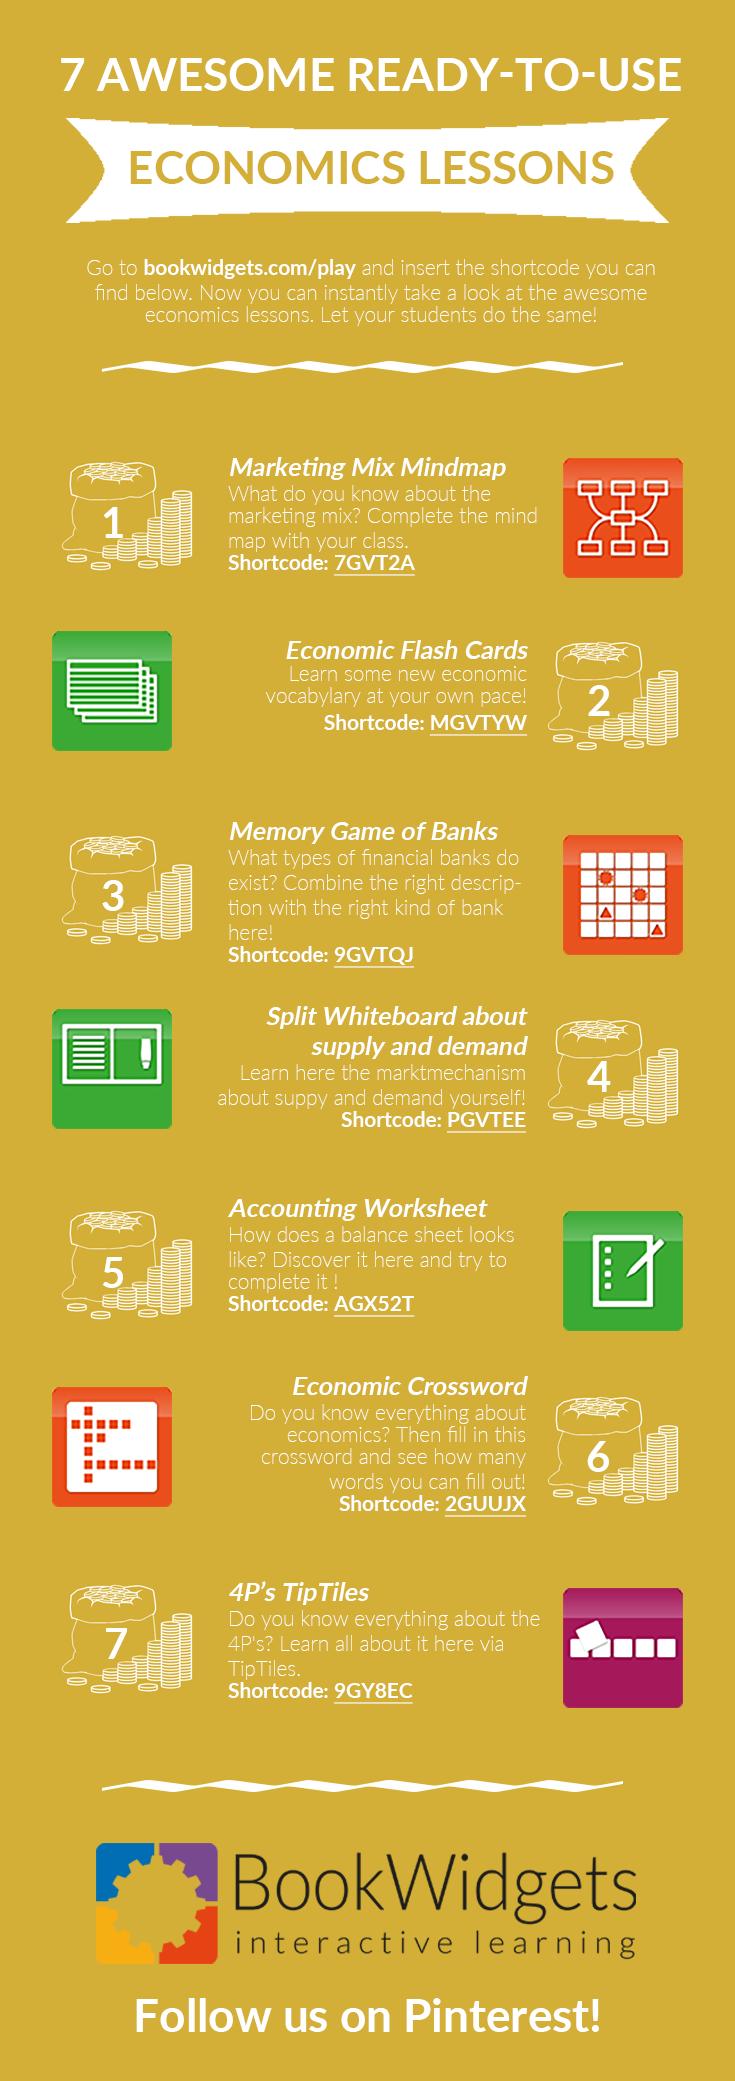 7 ready-to-use economics lessons